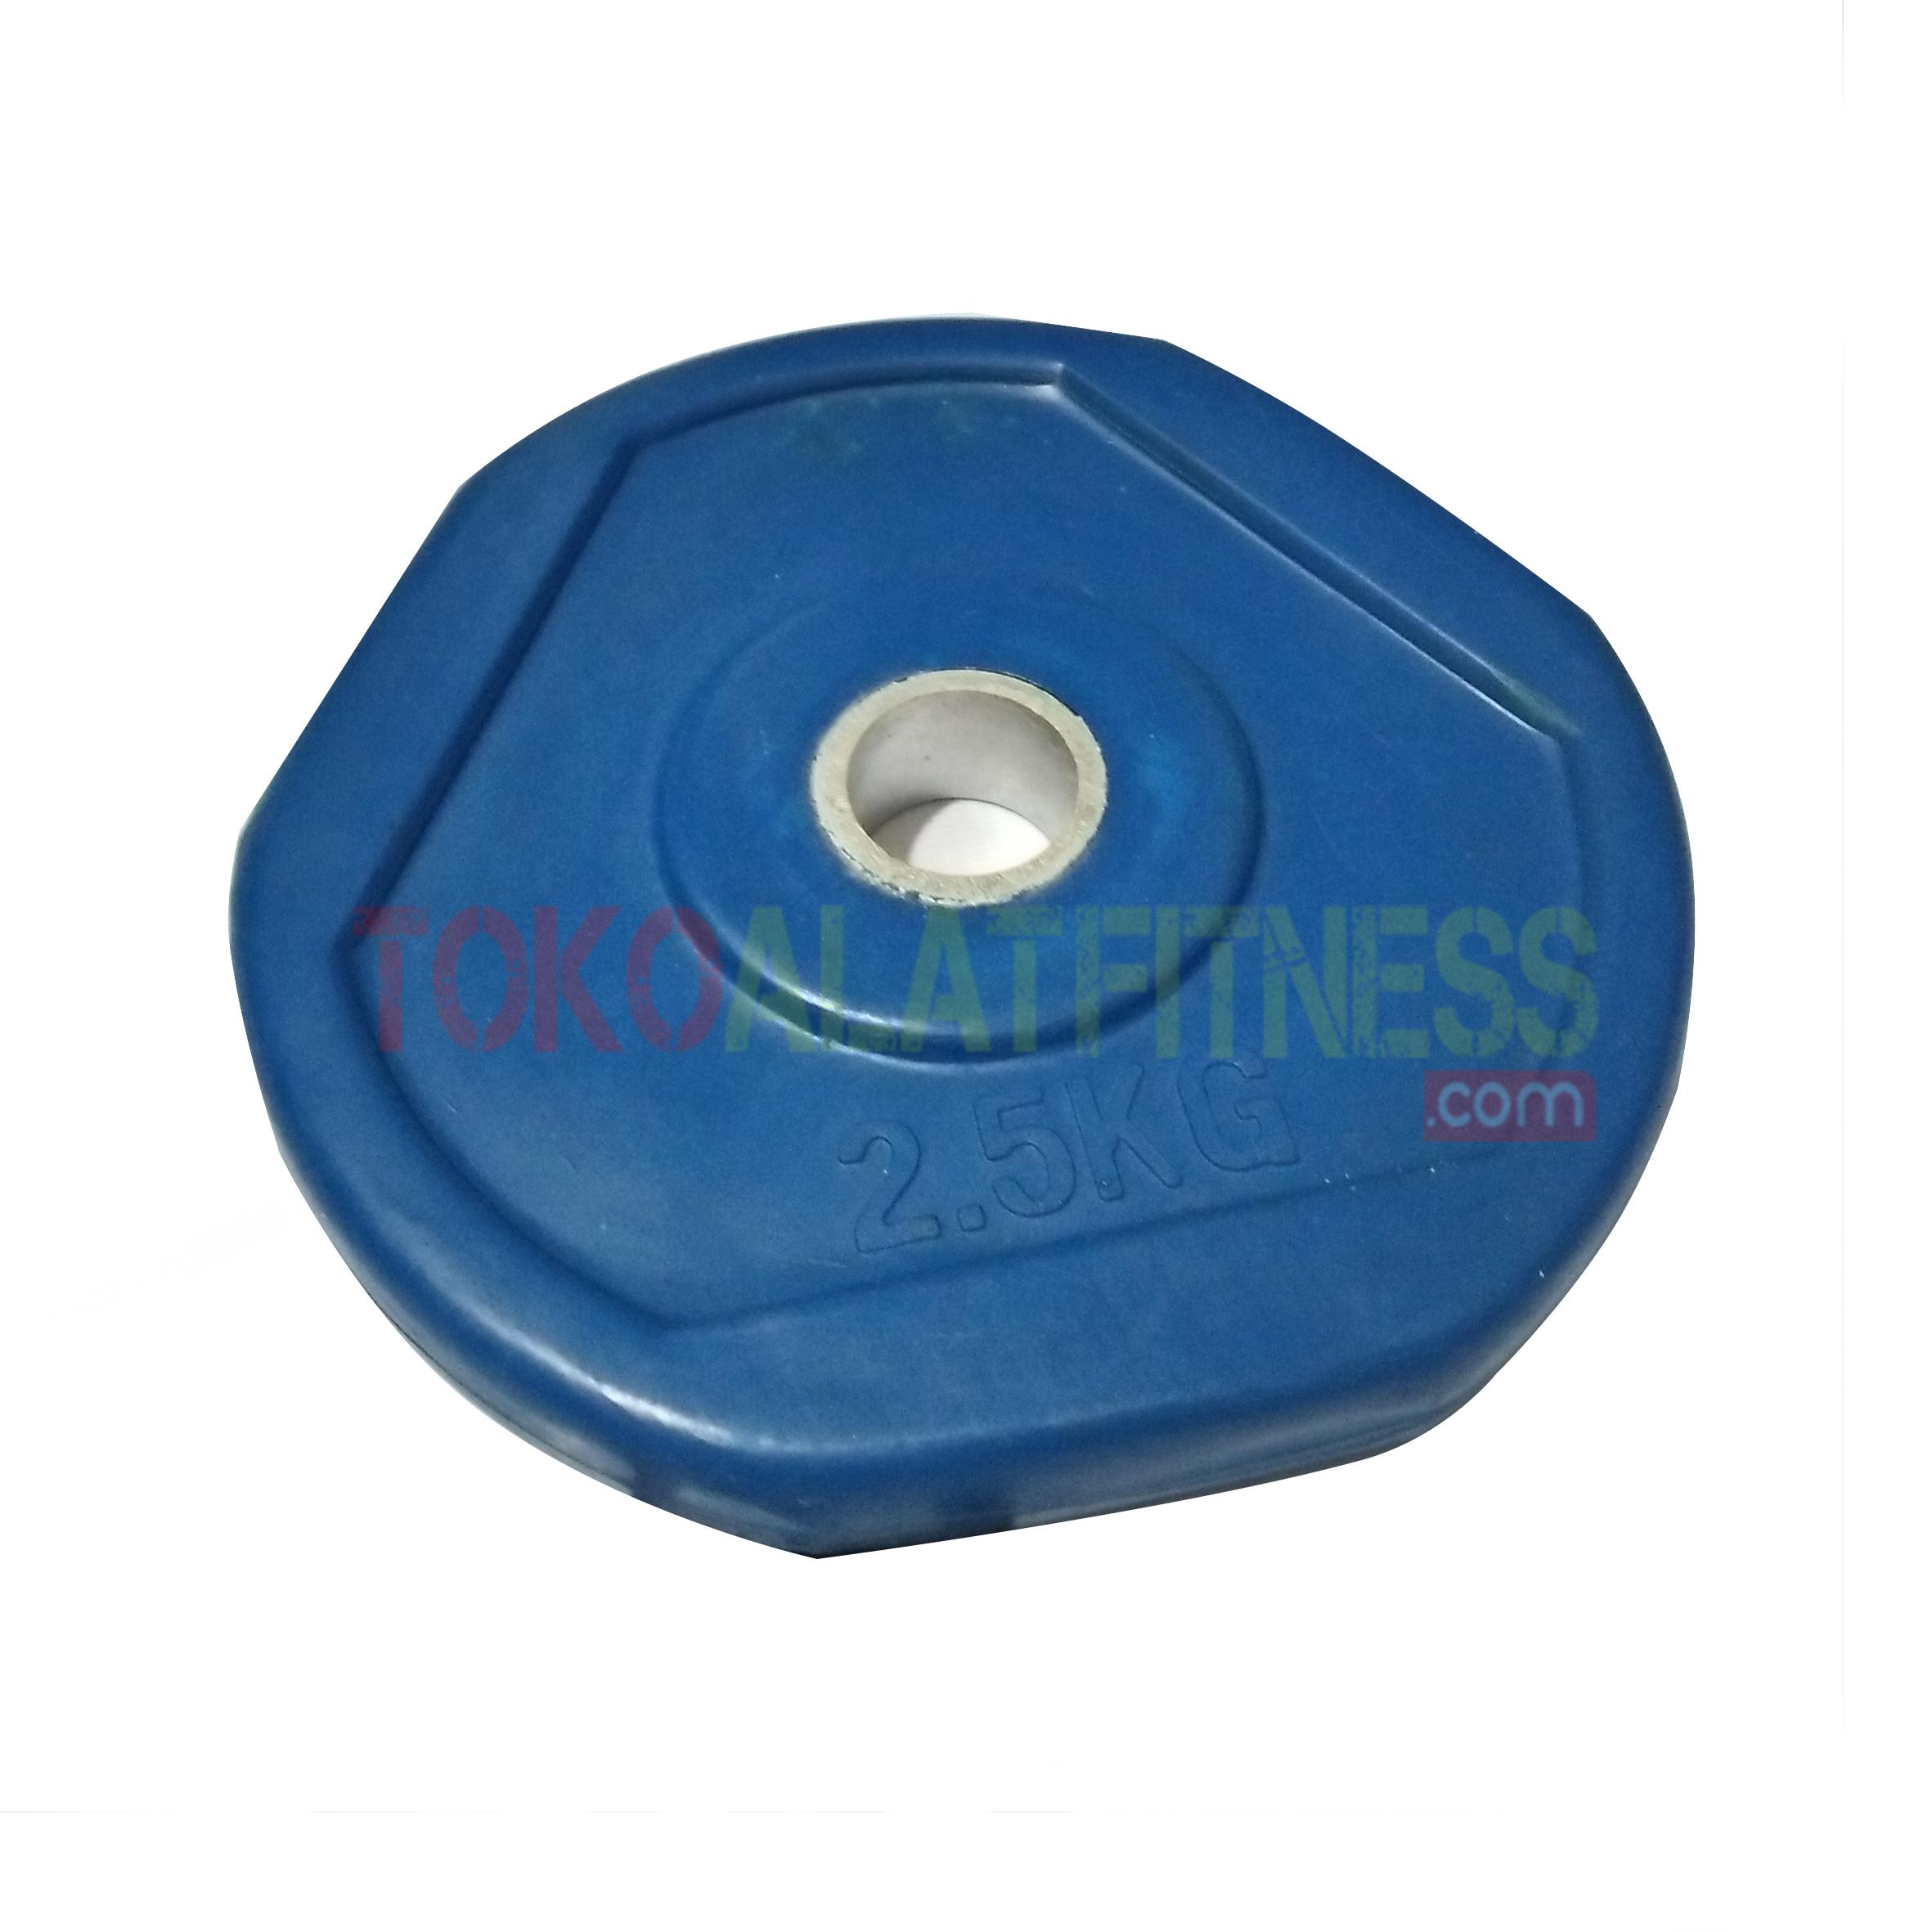 rubber plate biru 25 kg - Rubber Plate Grip Warna 3cm Biru 2.5kg Body Gym